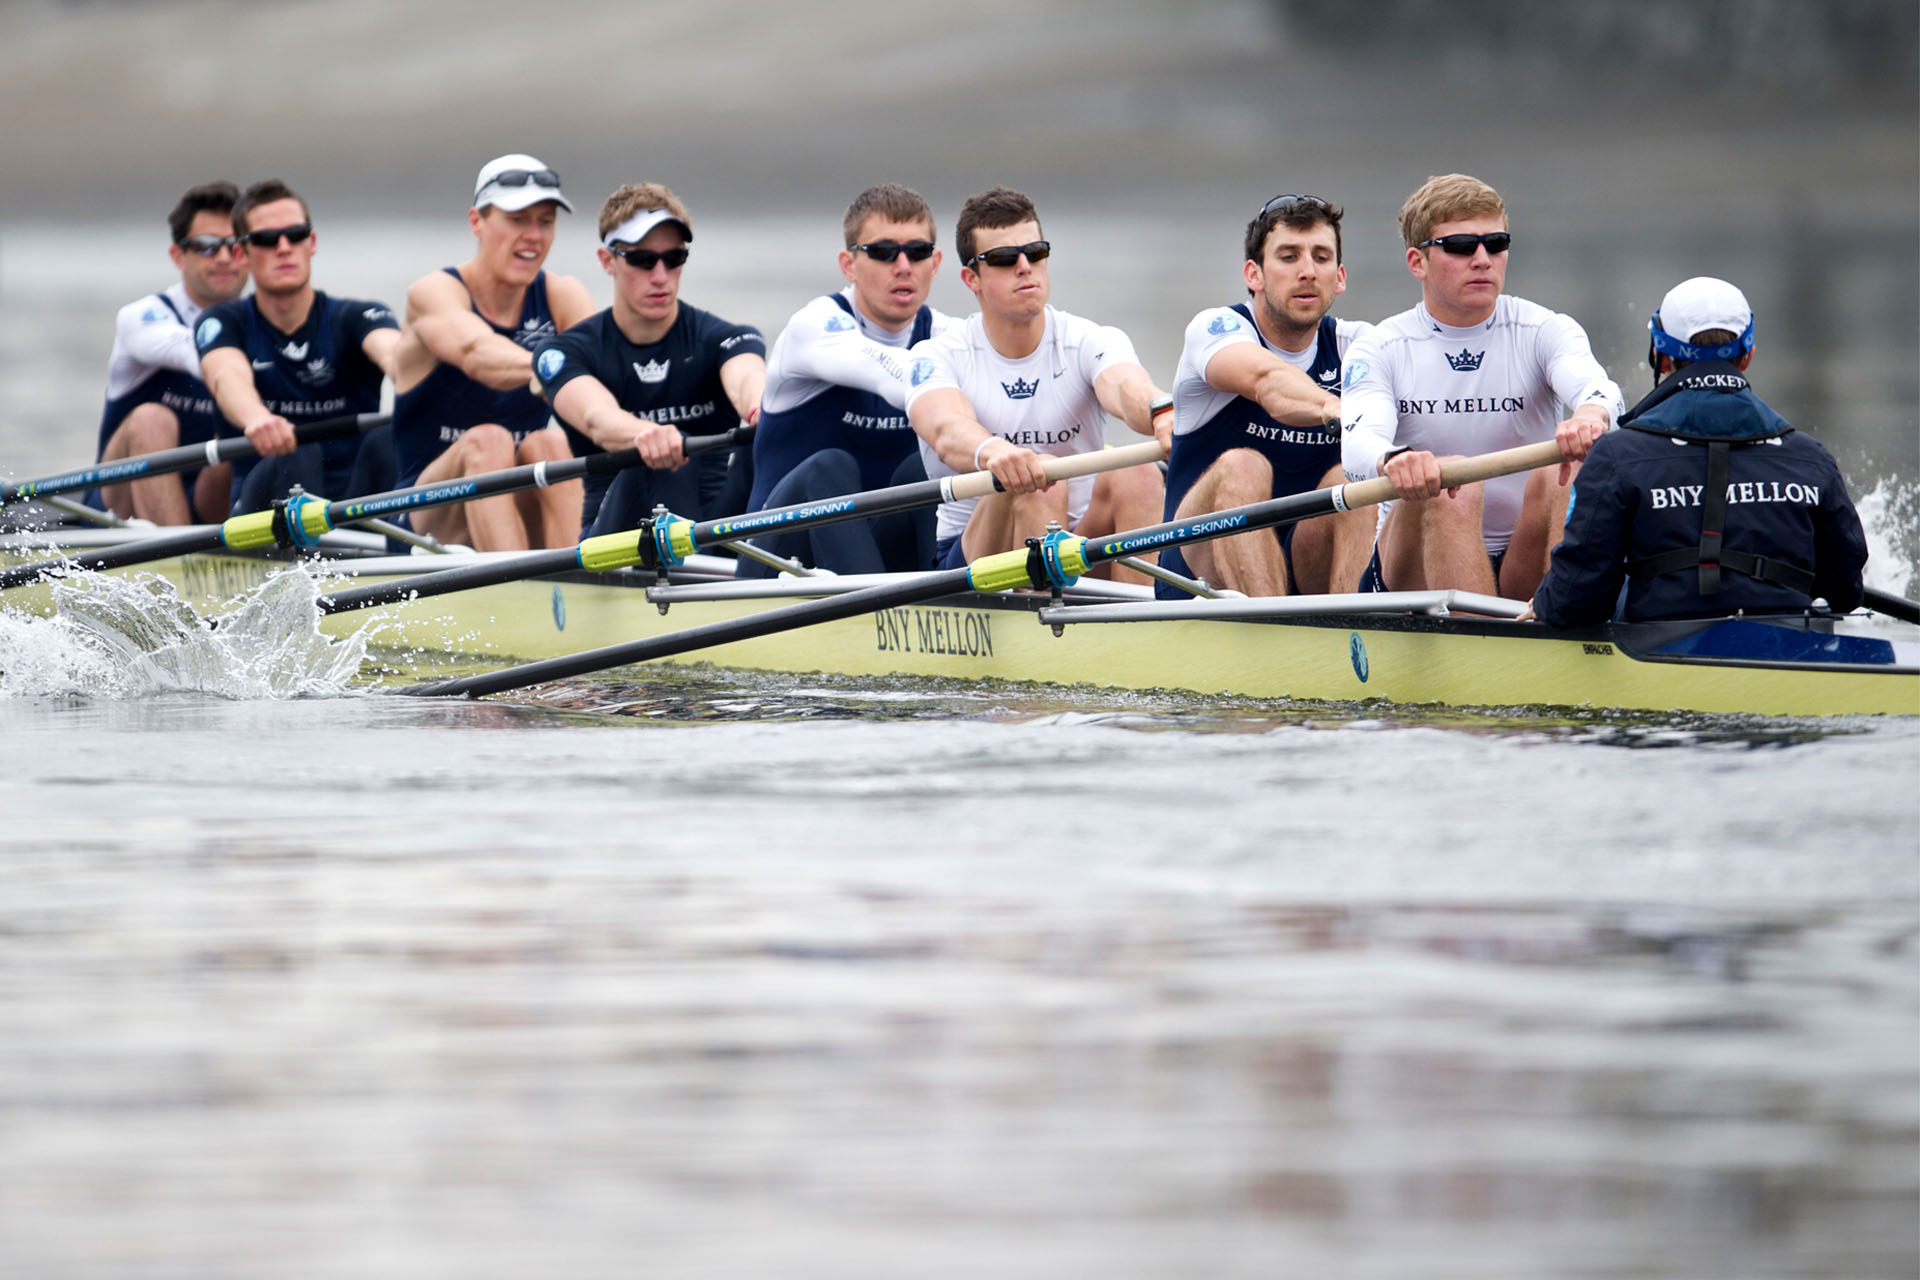 boat race, oxbridge, londra